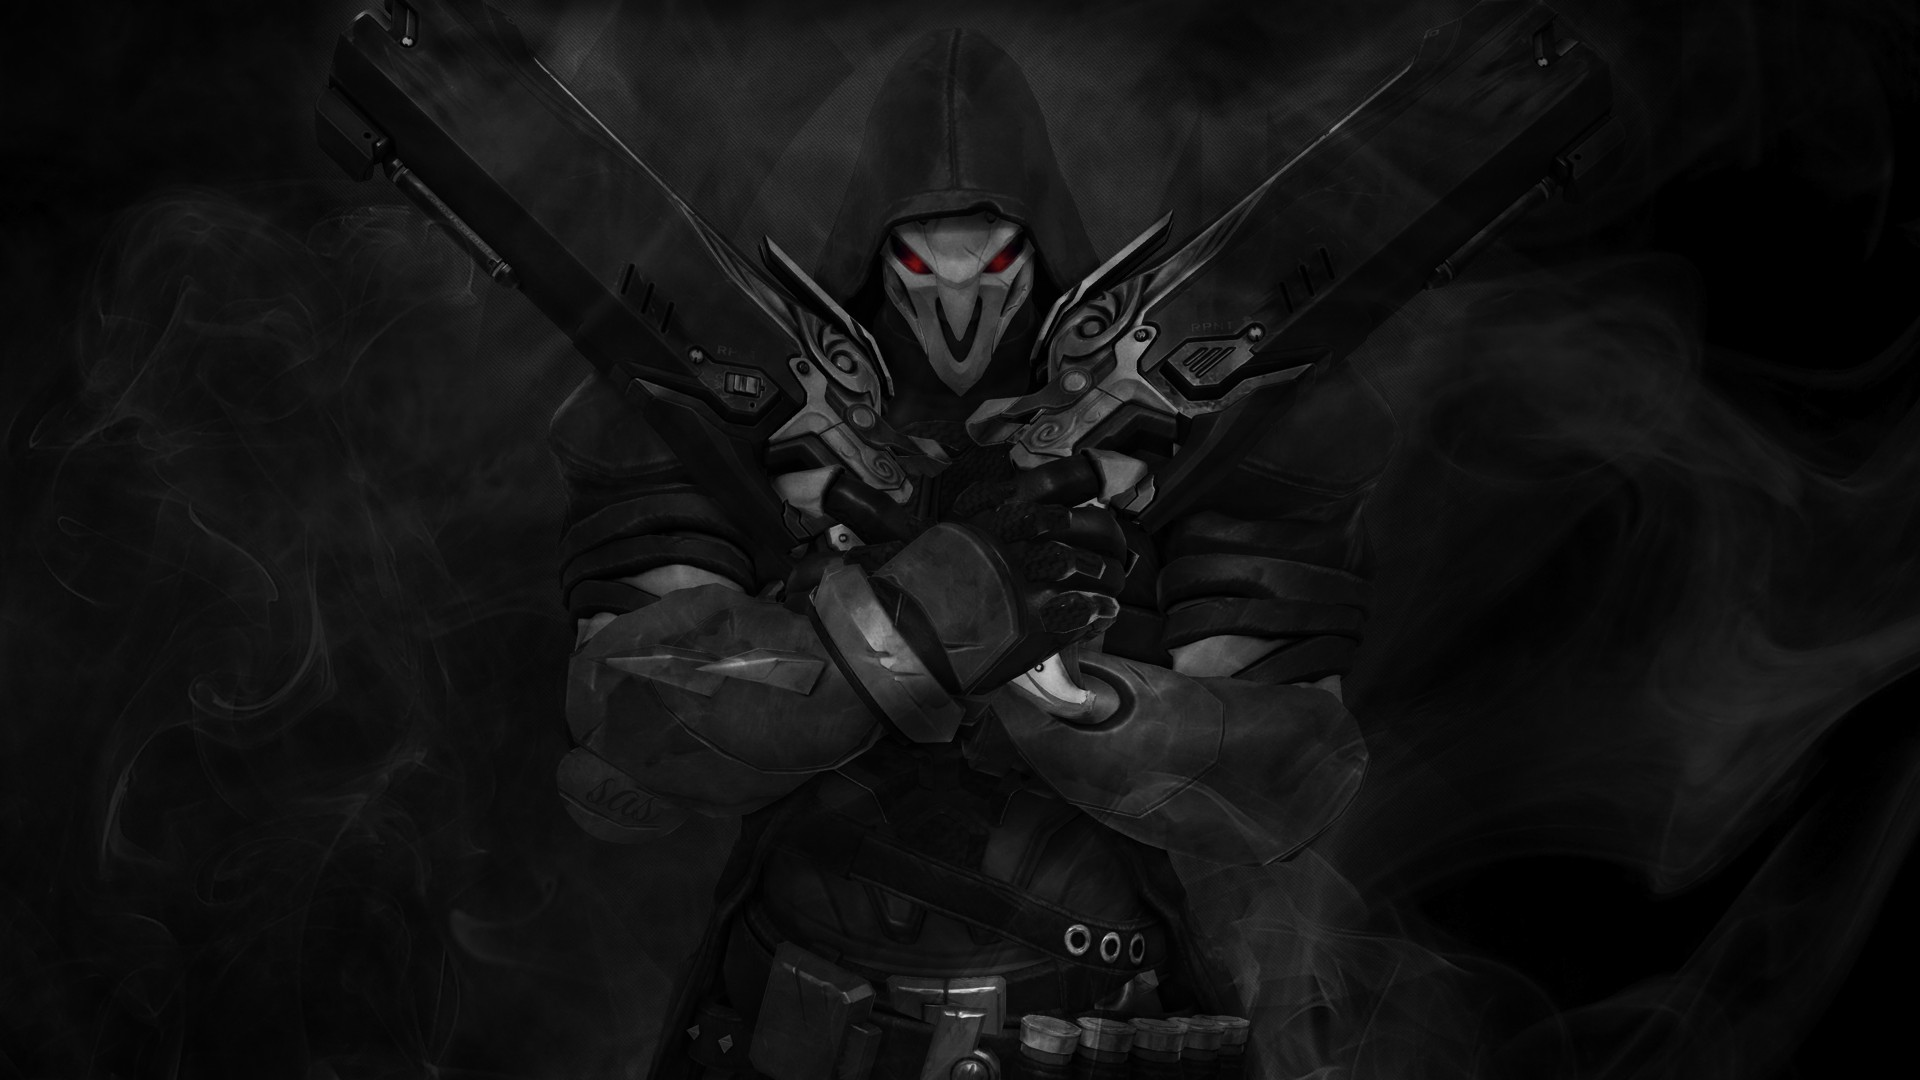 reaper overwatch wallpaper 183�� download free amazing full